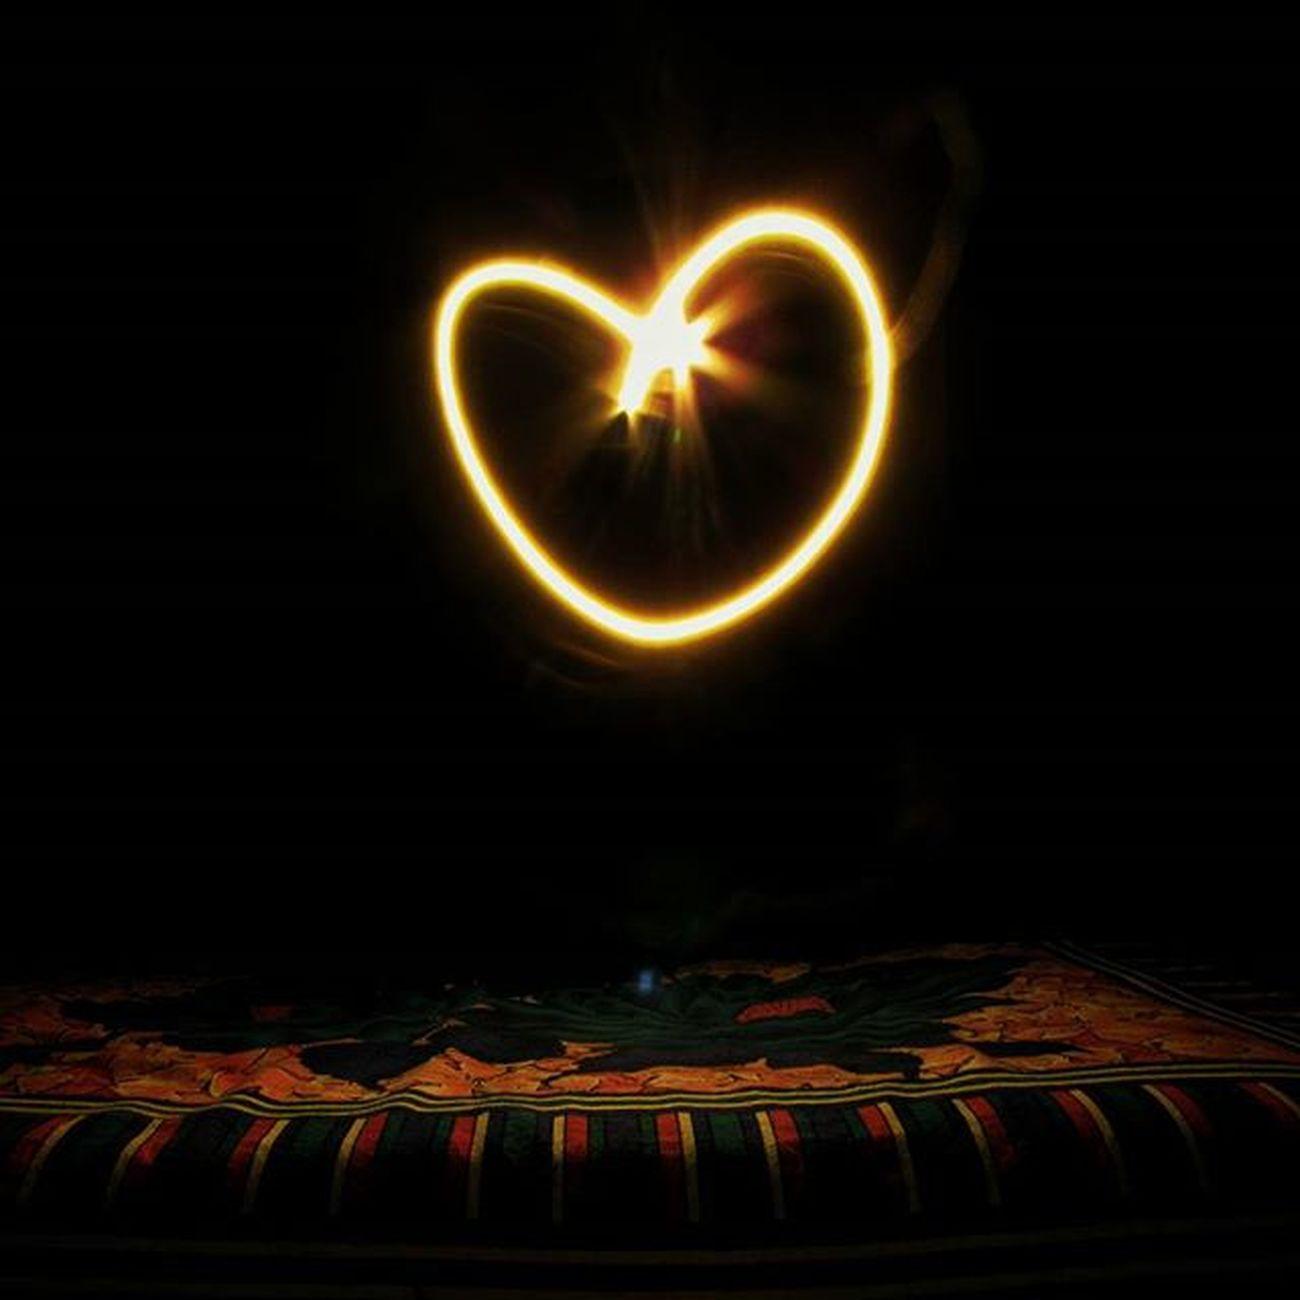 || H E A R T || Heart Lightpainting LghtArt Slowshutter Camera Canon Timepass Playing Ig_calcutta Lights Diwali Kalipuja DiwaliwithLP Lonelyplanetindia LPIndia _cic Kolkata_igers Kolkata House